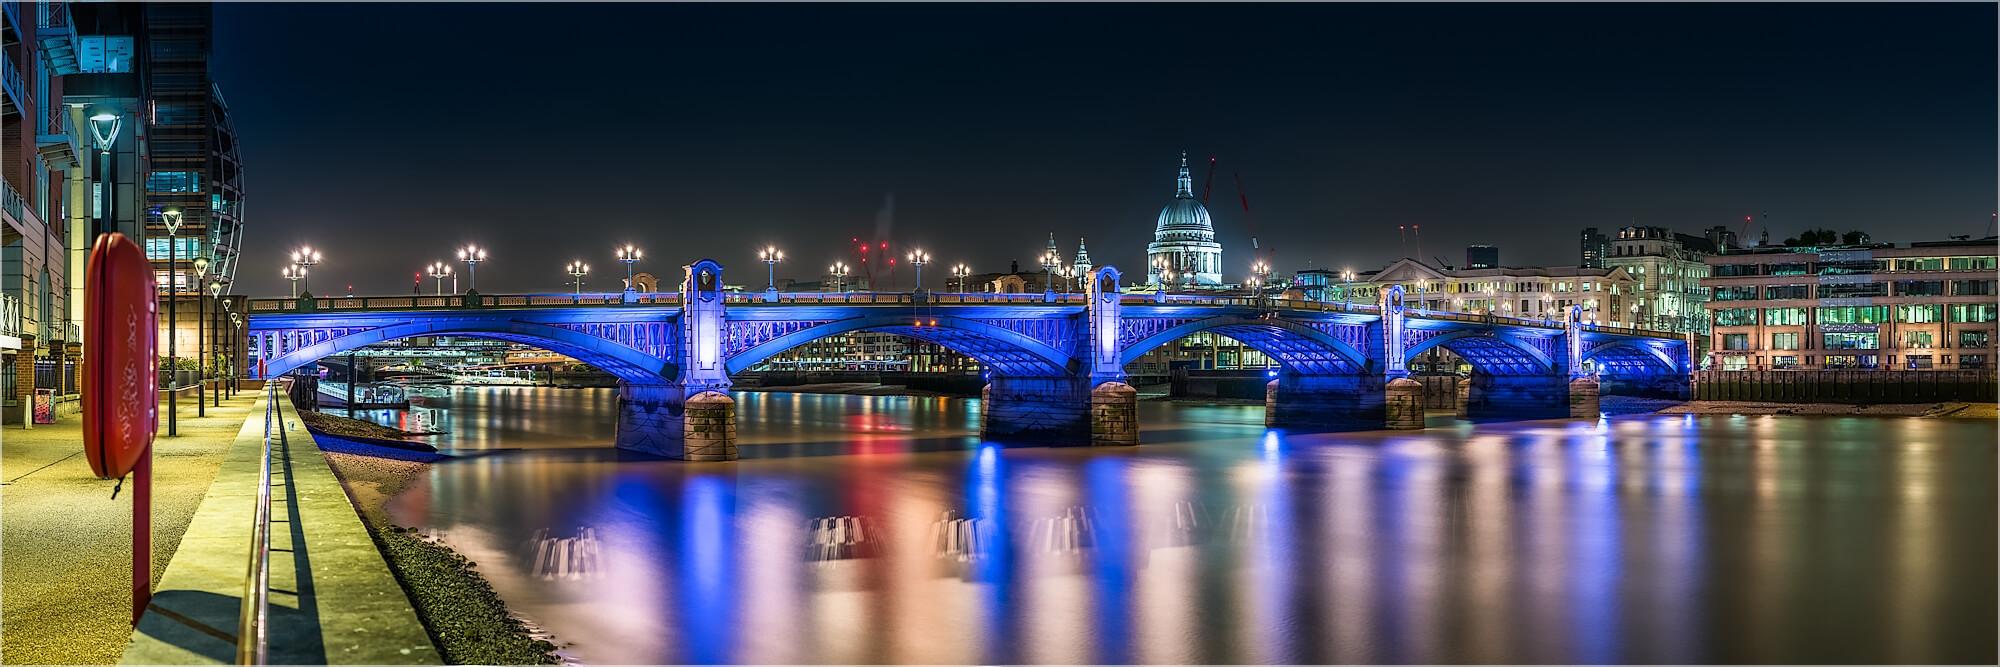 Panoramabild London Southwalk Bridge St. Pauls Cathedral